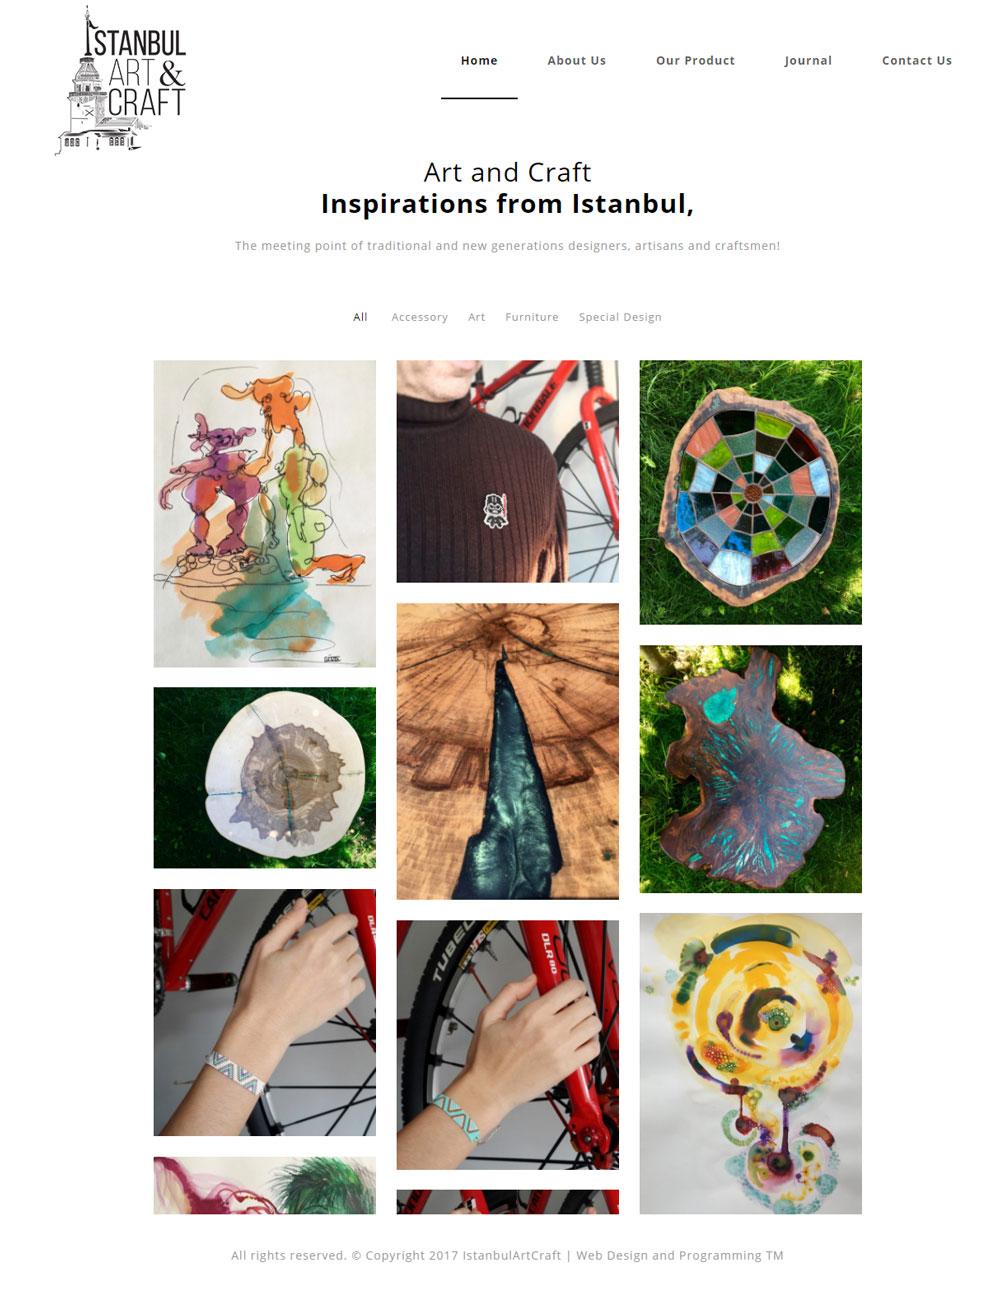 Istanbul Art & Craft